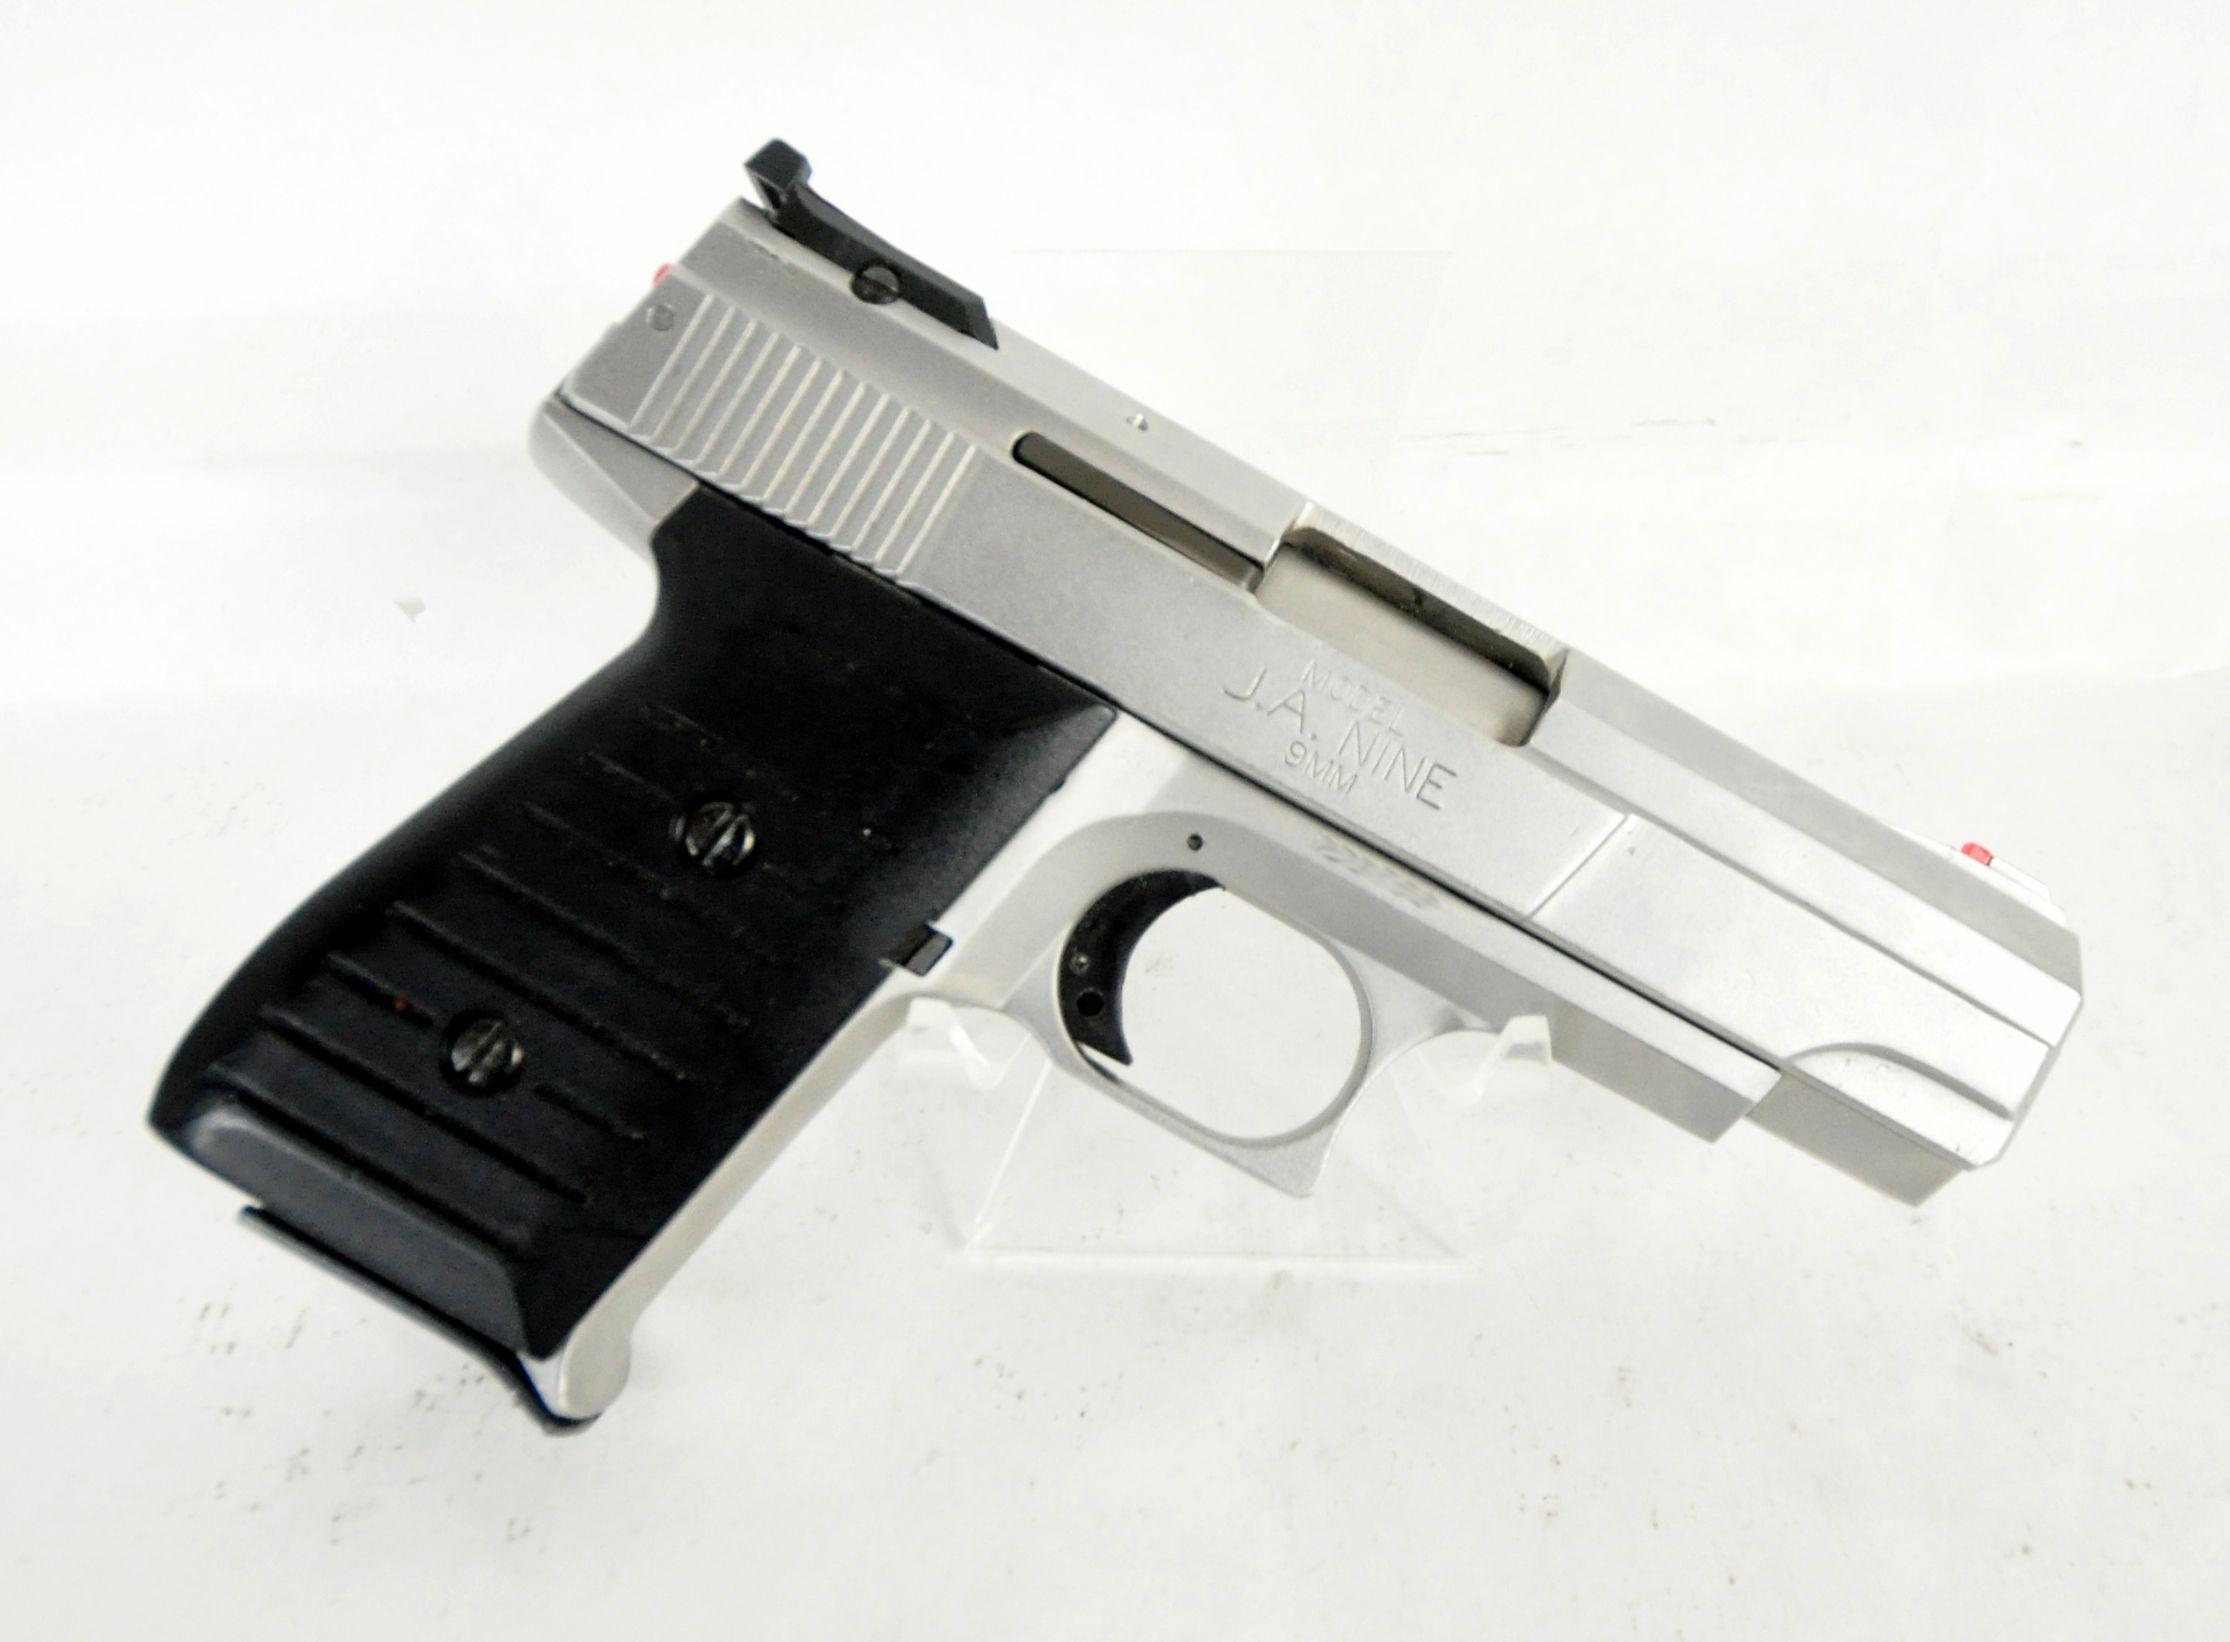 Jimenez Arms J A  Nine Satin Nickel 9mm  This 9mm DAO handgun from